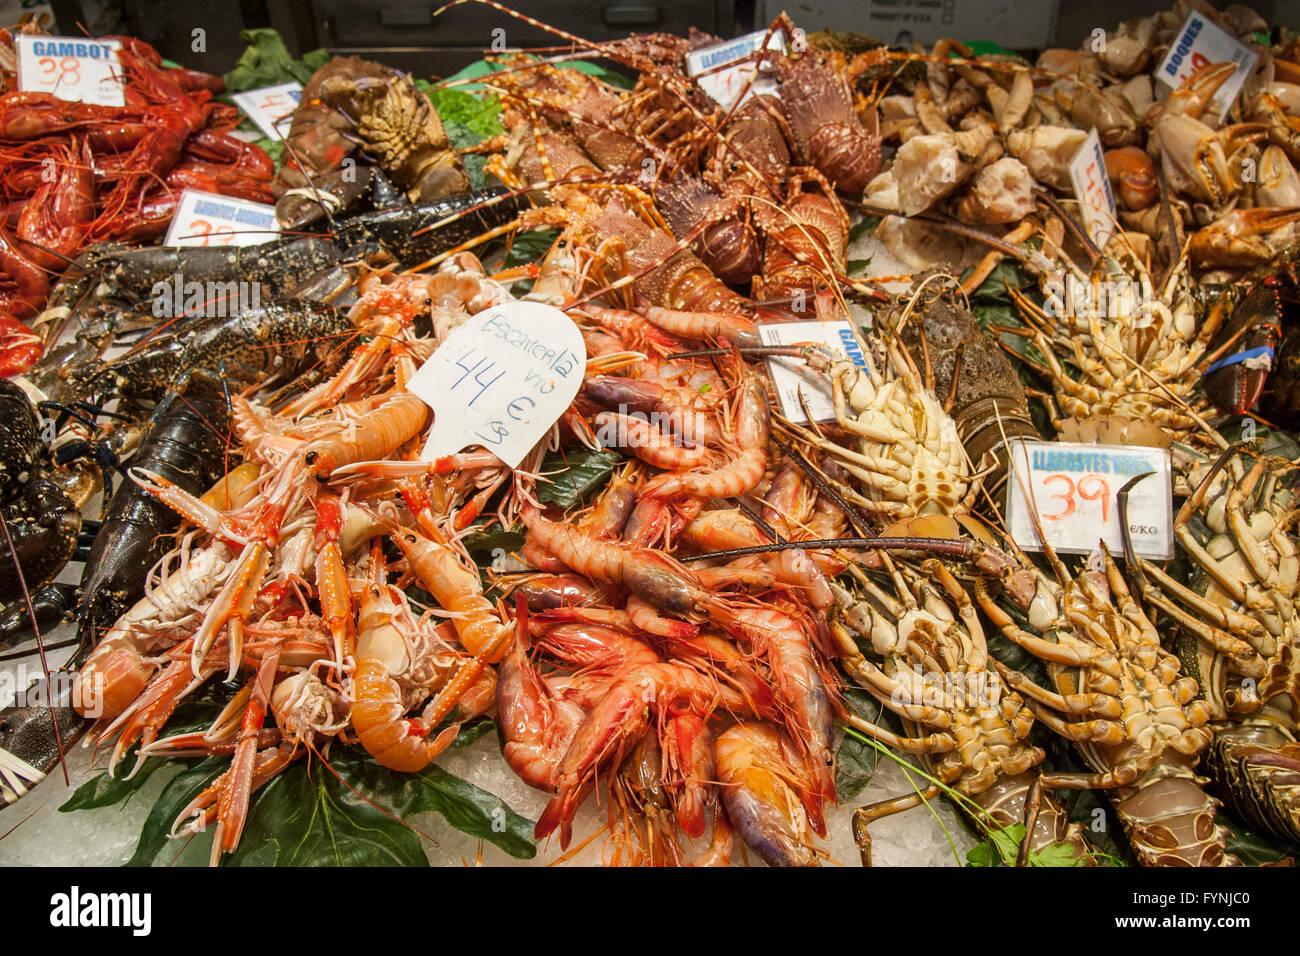 Meeresfrüchte, Fisch, Mercat de Sant Josep befindet sich auf der La Rambla, La Boqueria, Barcelona, Spanien Stockbild